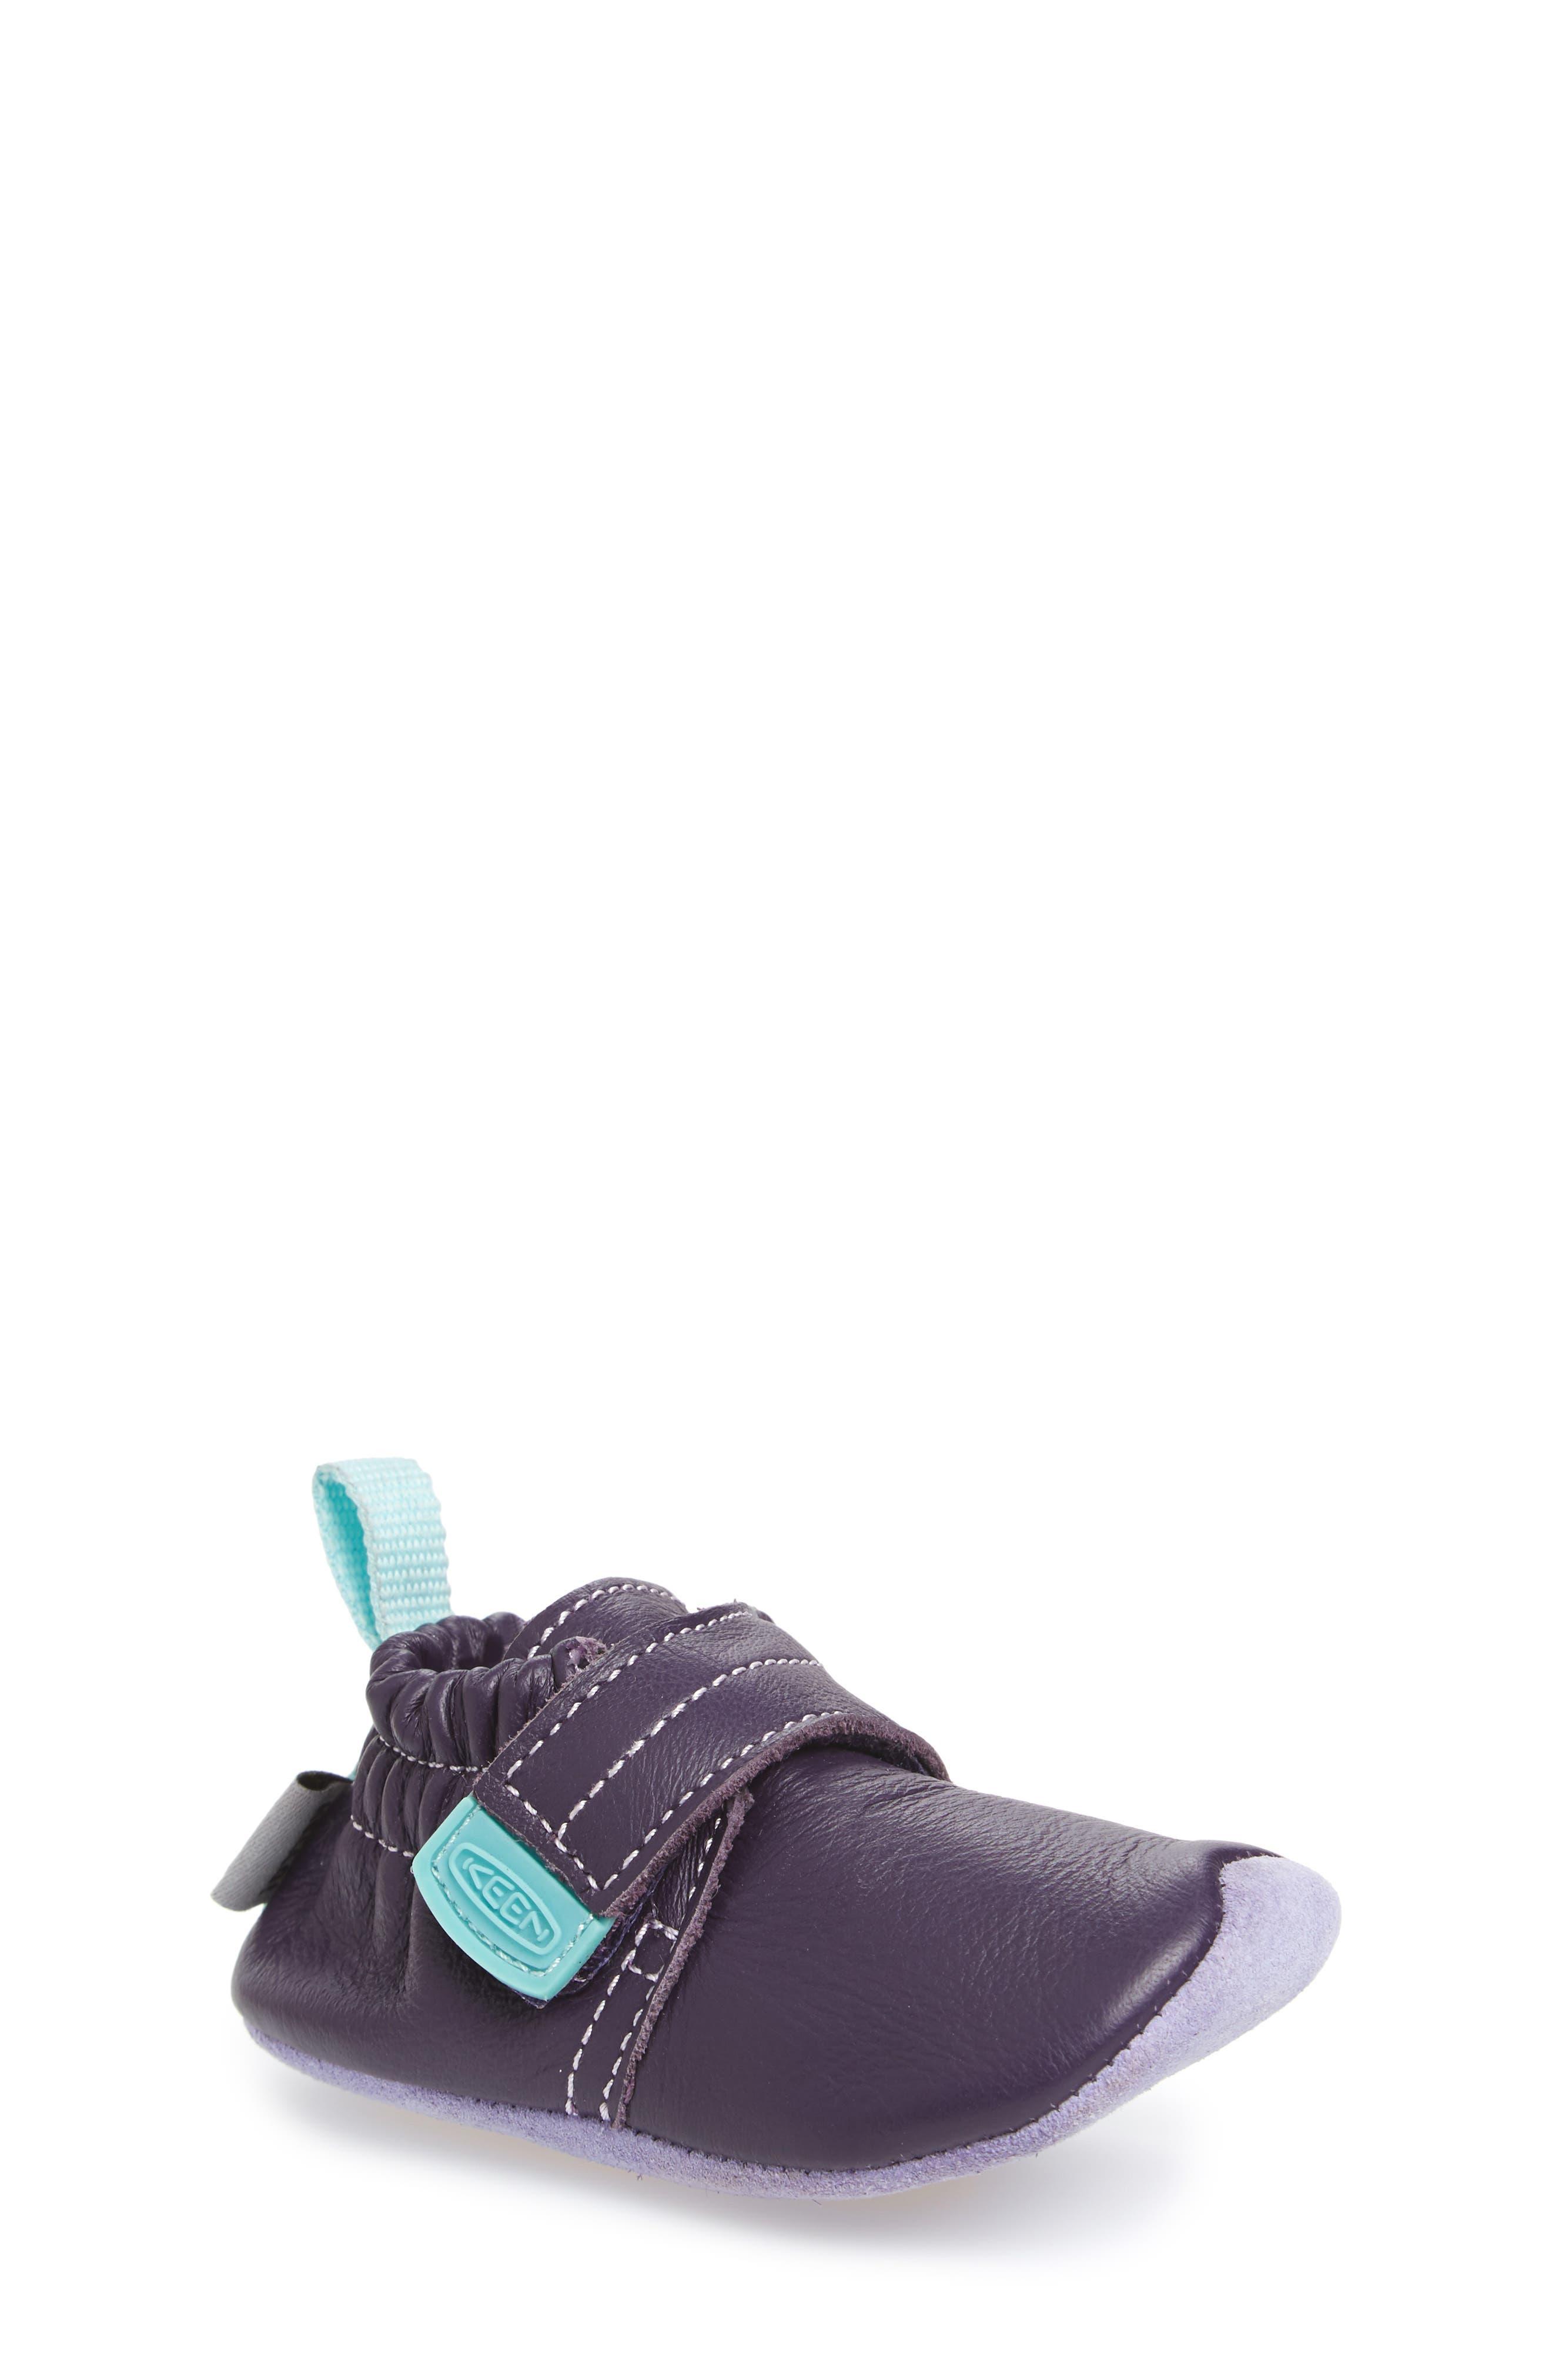 Leo Crib Shoe,                             Main thumbnail 1, color,                             PURPLE / SWEET LAVENDER